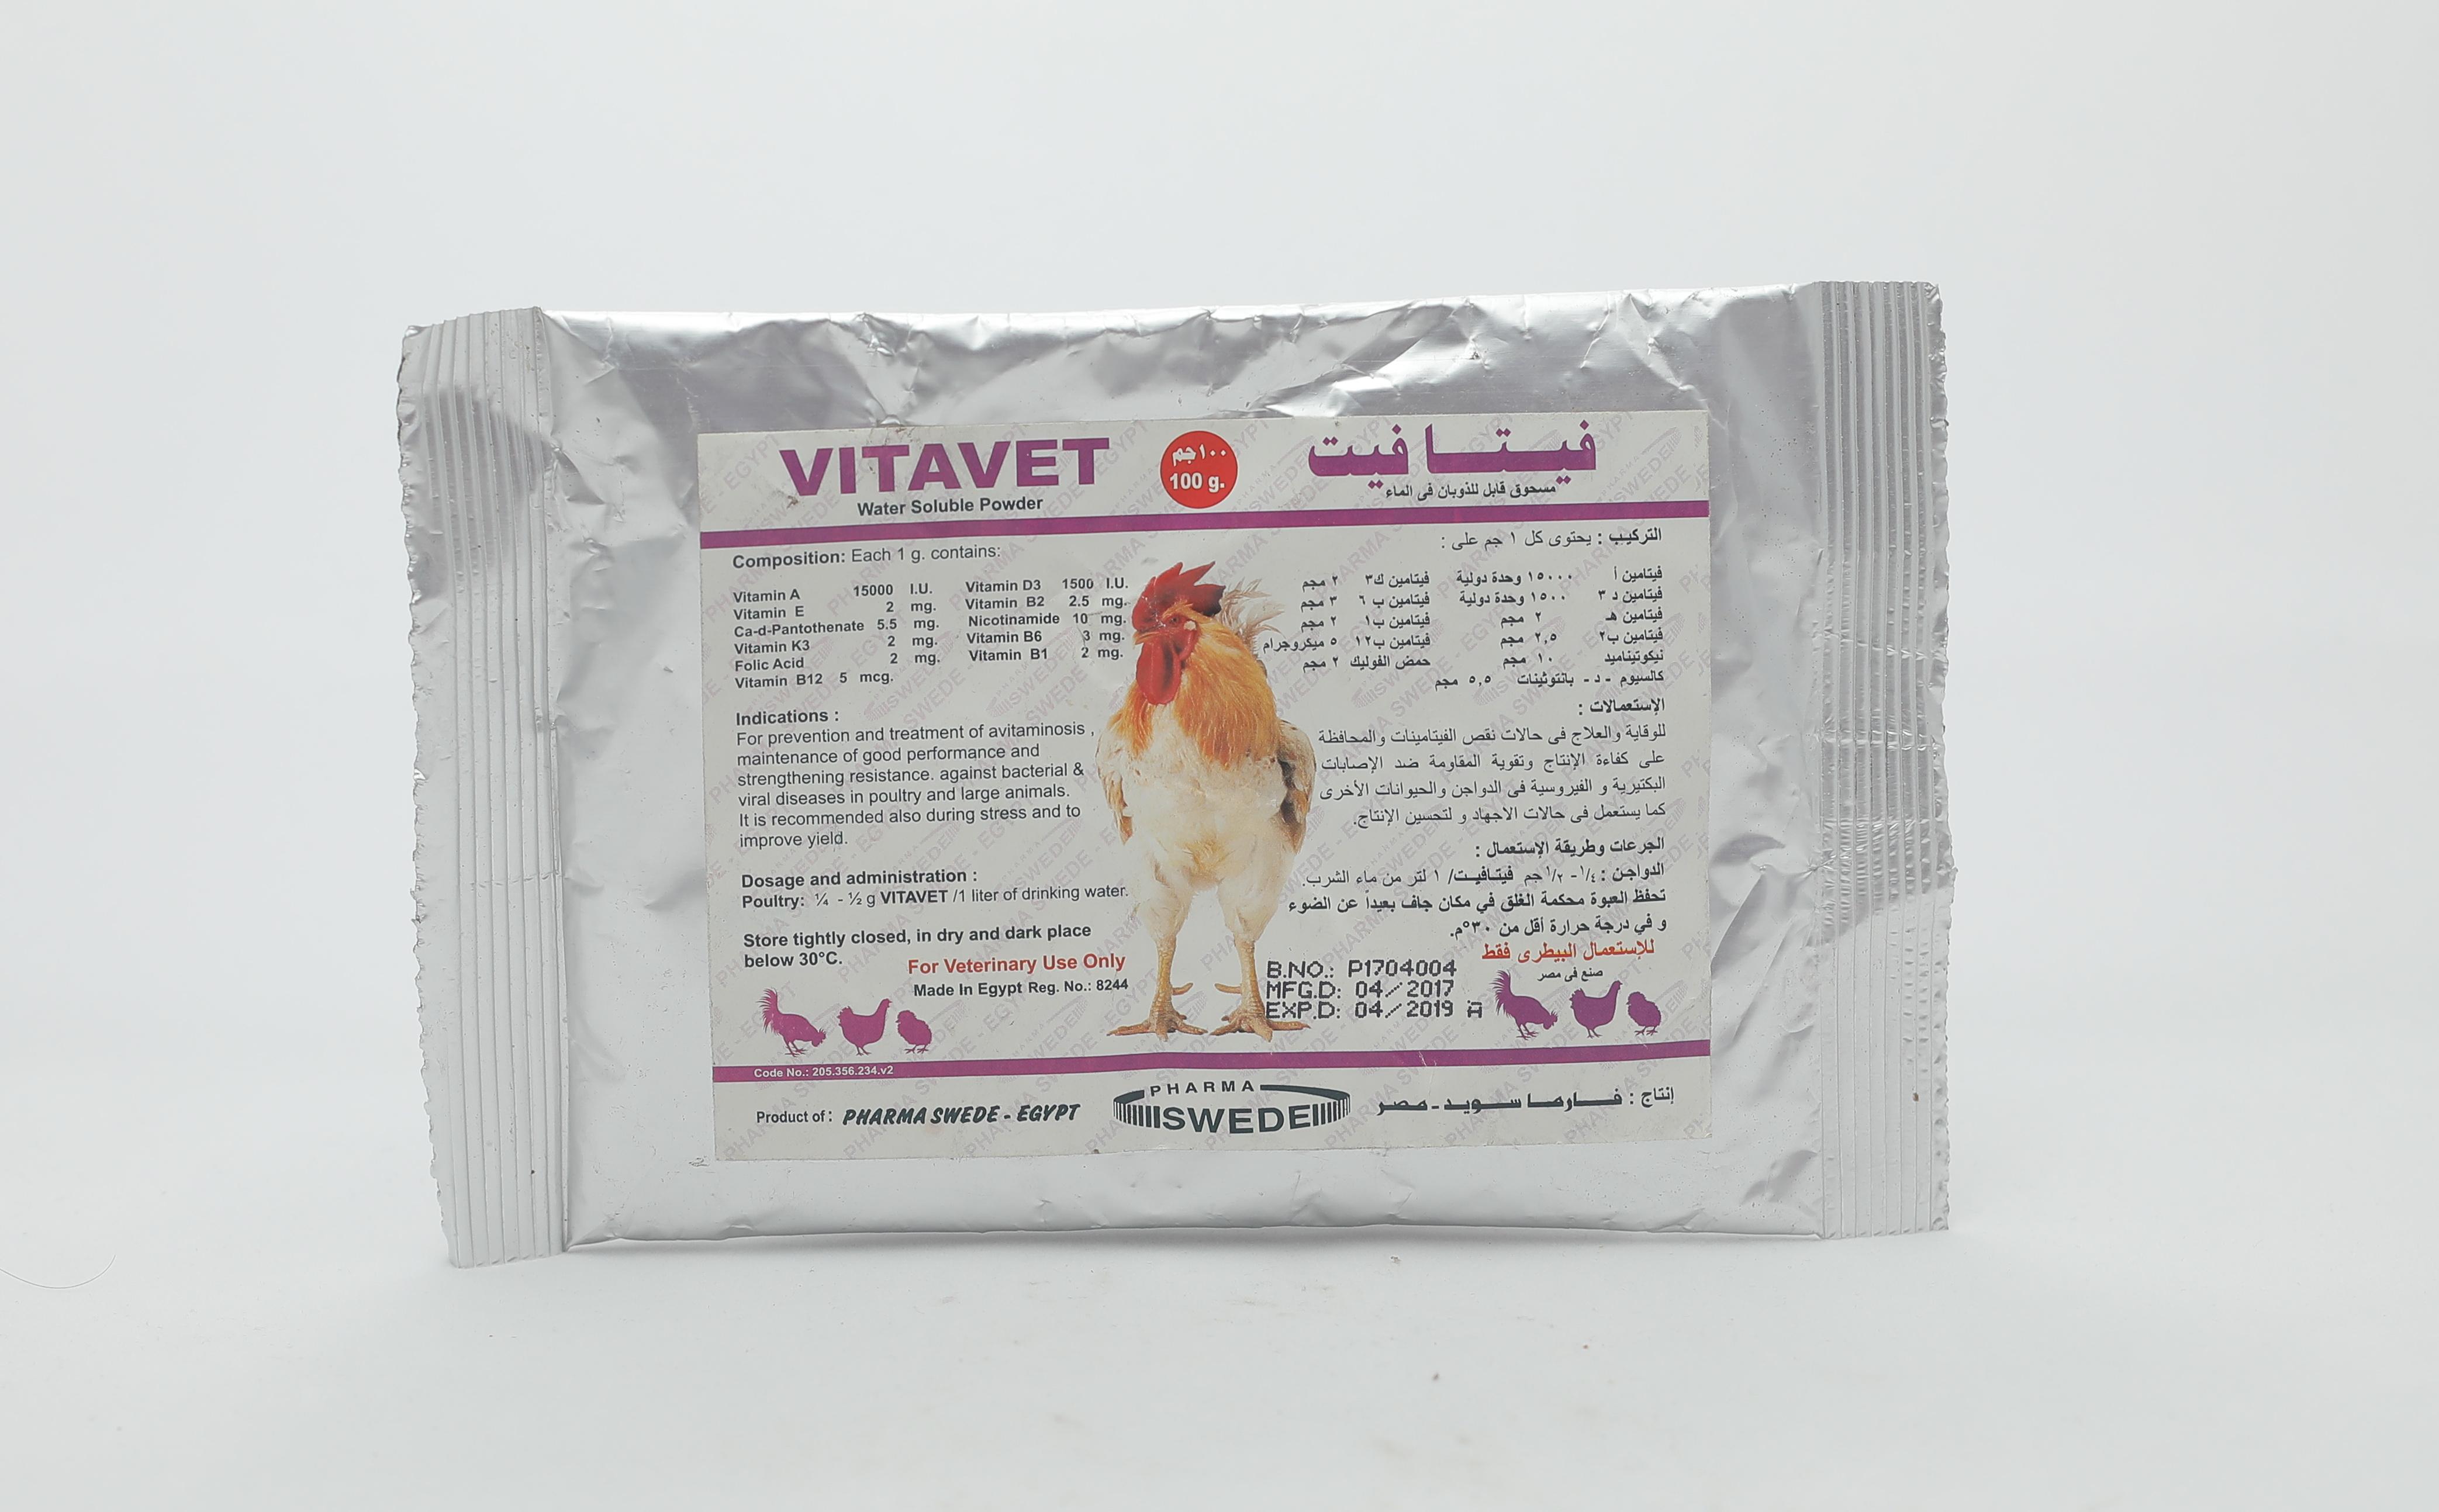 Vitavet Powder